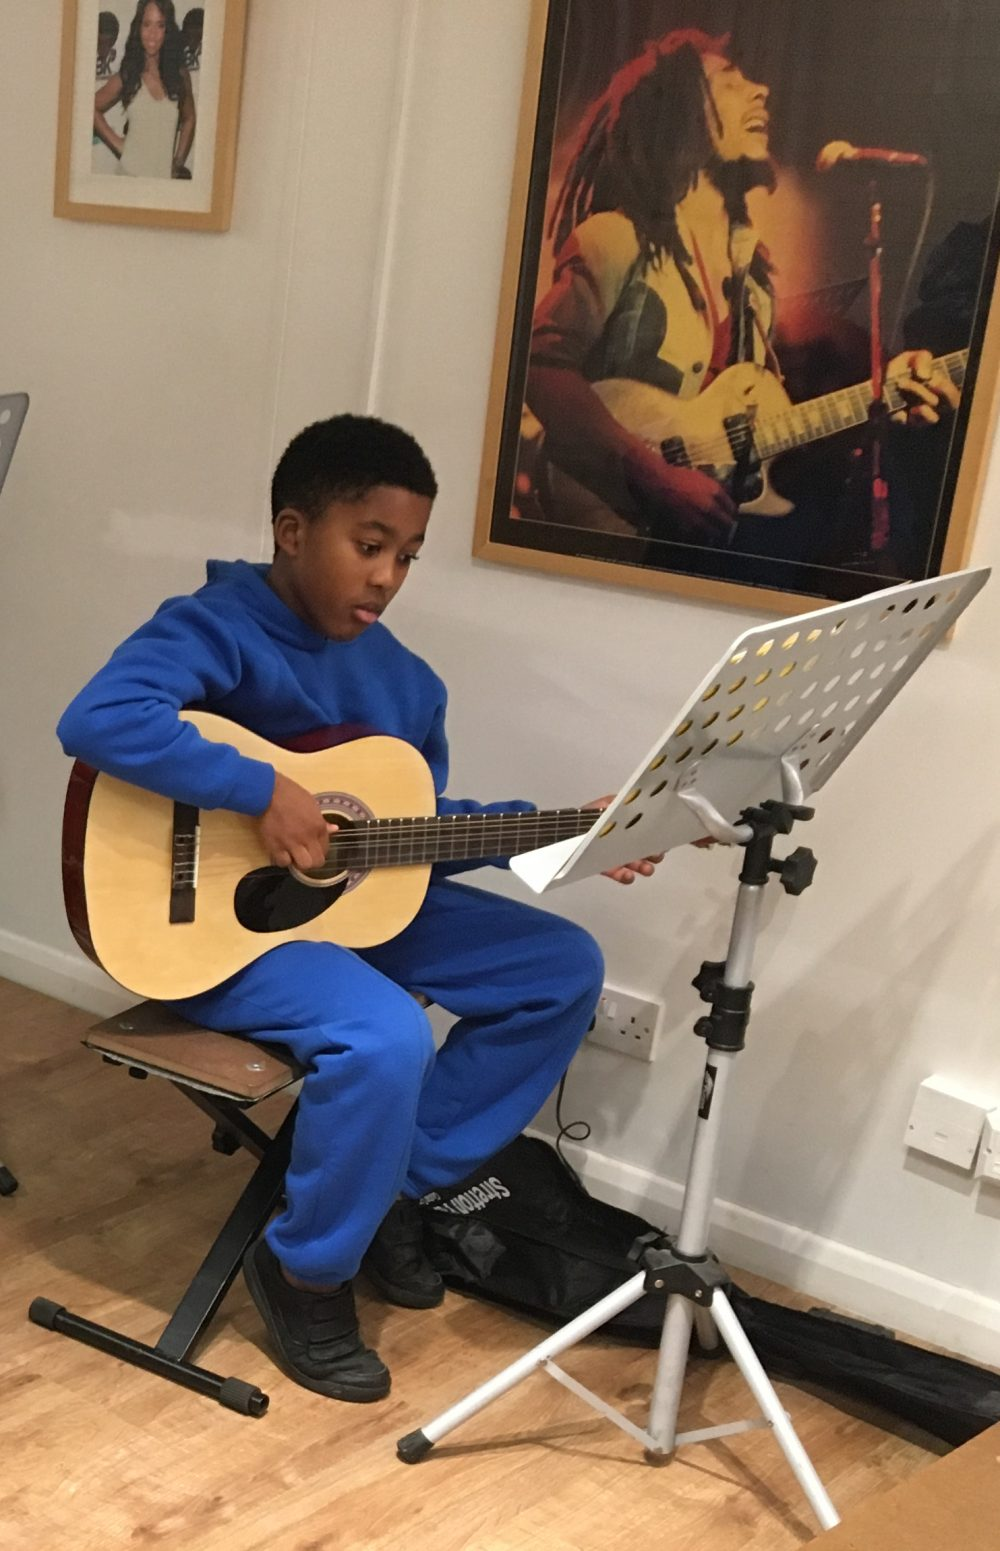 Lewisham Guitar Lessons 0208-185-7368